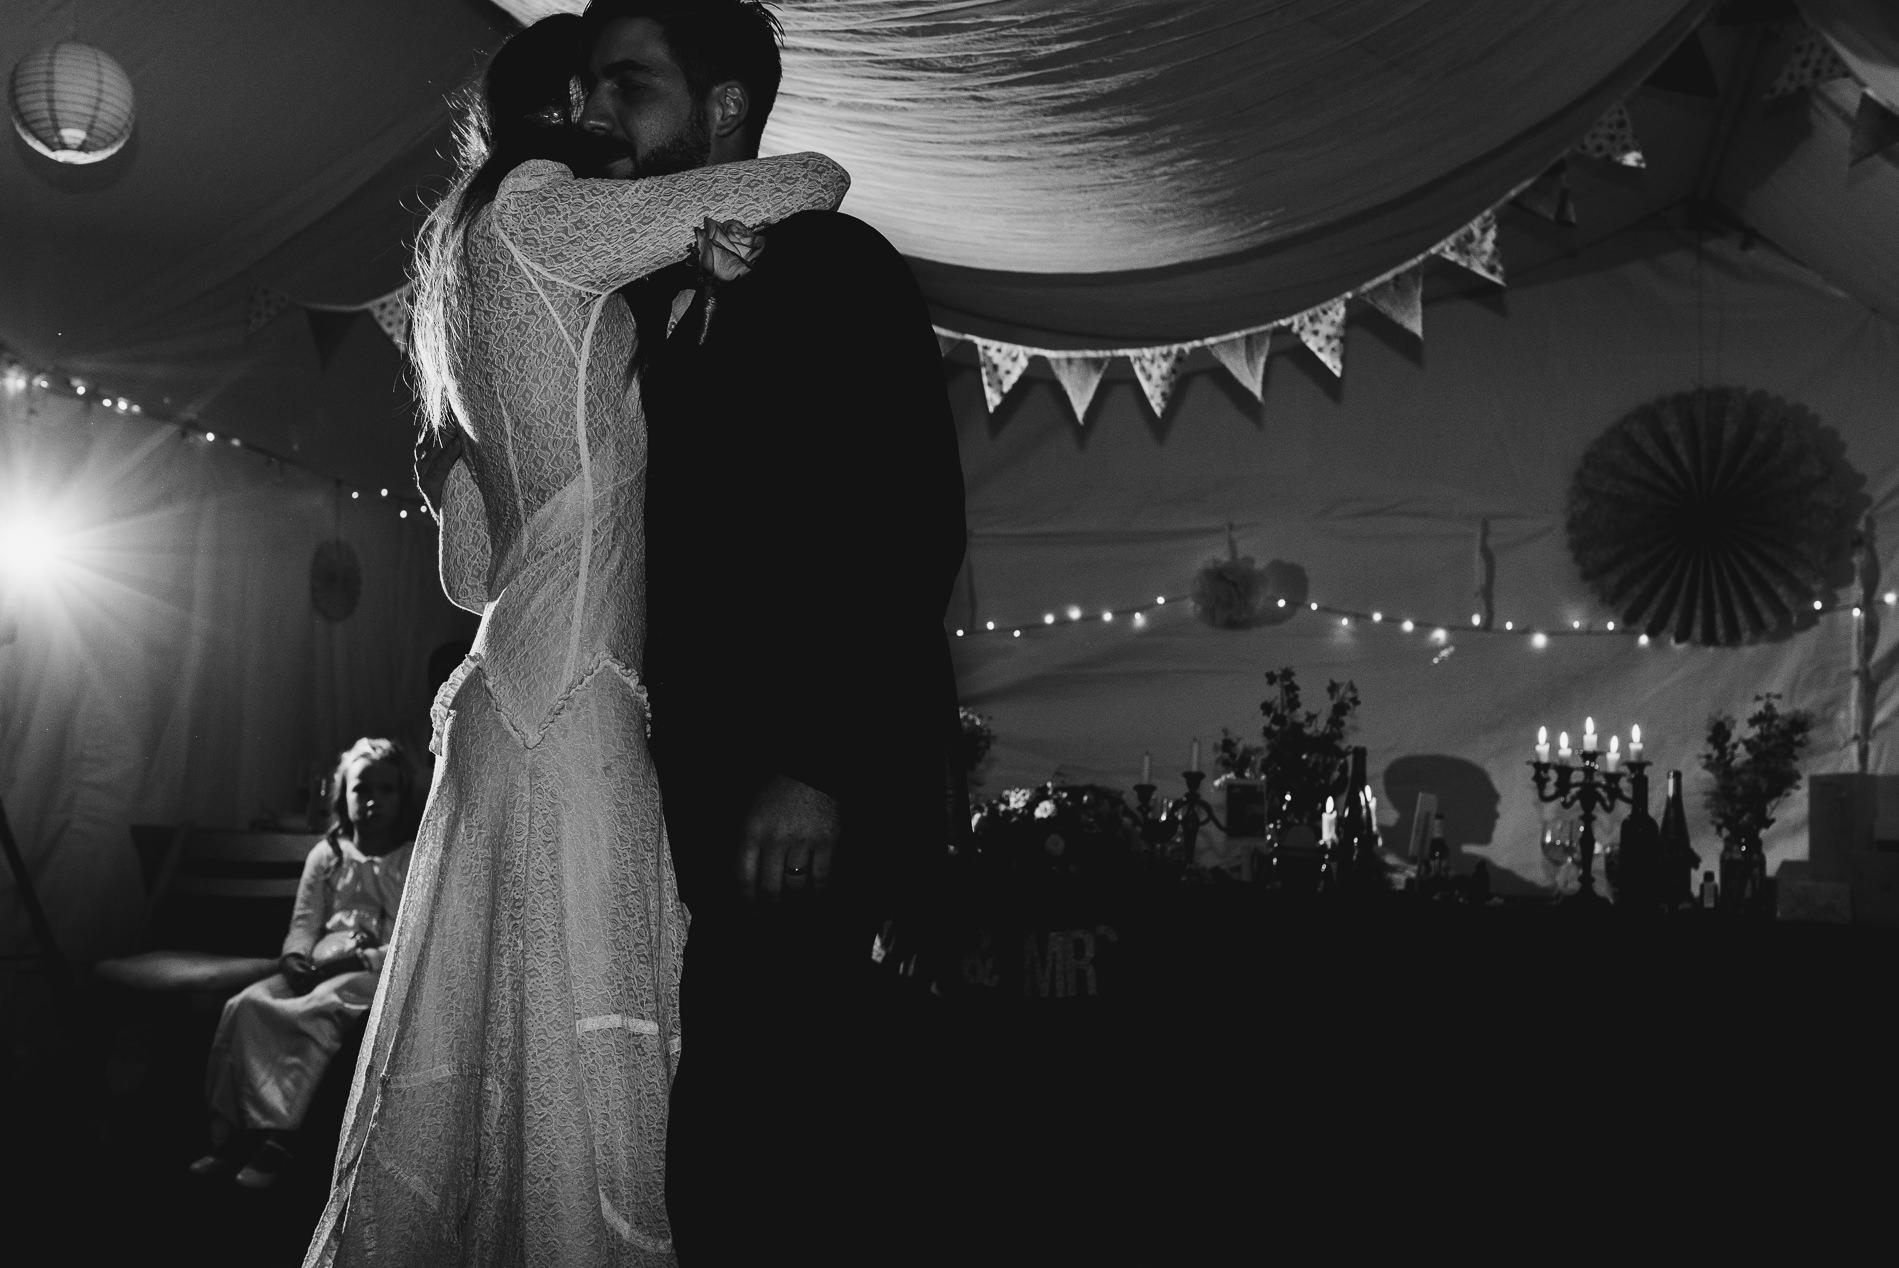 bohemian_wedding_lawshall_church_garden135